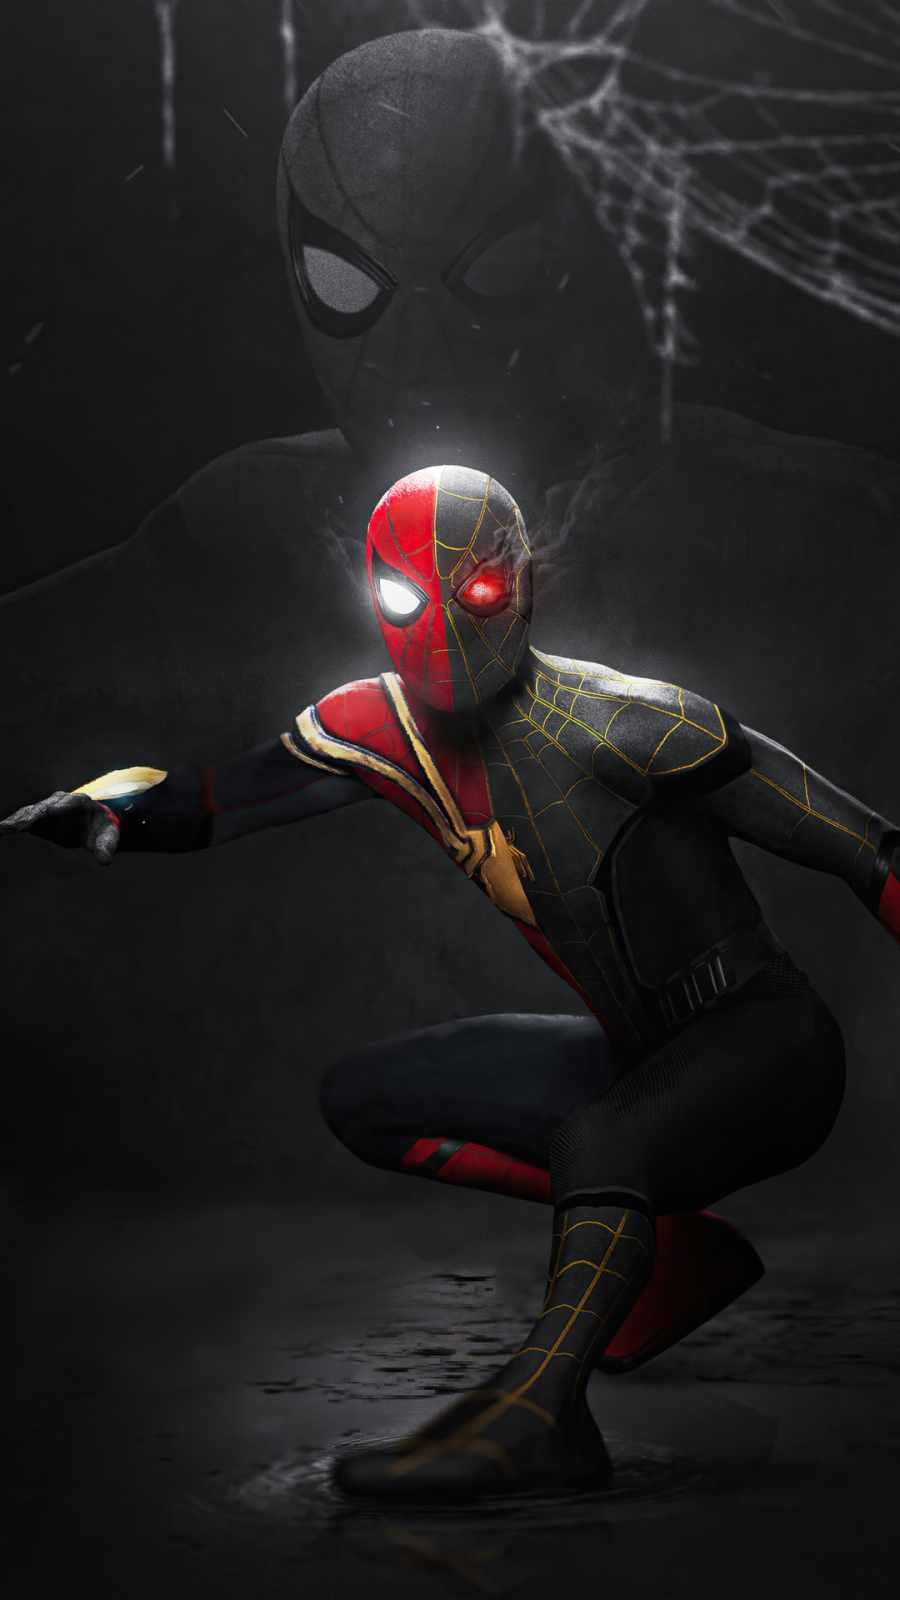 iron spider x gold suit